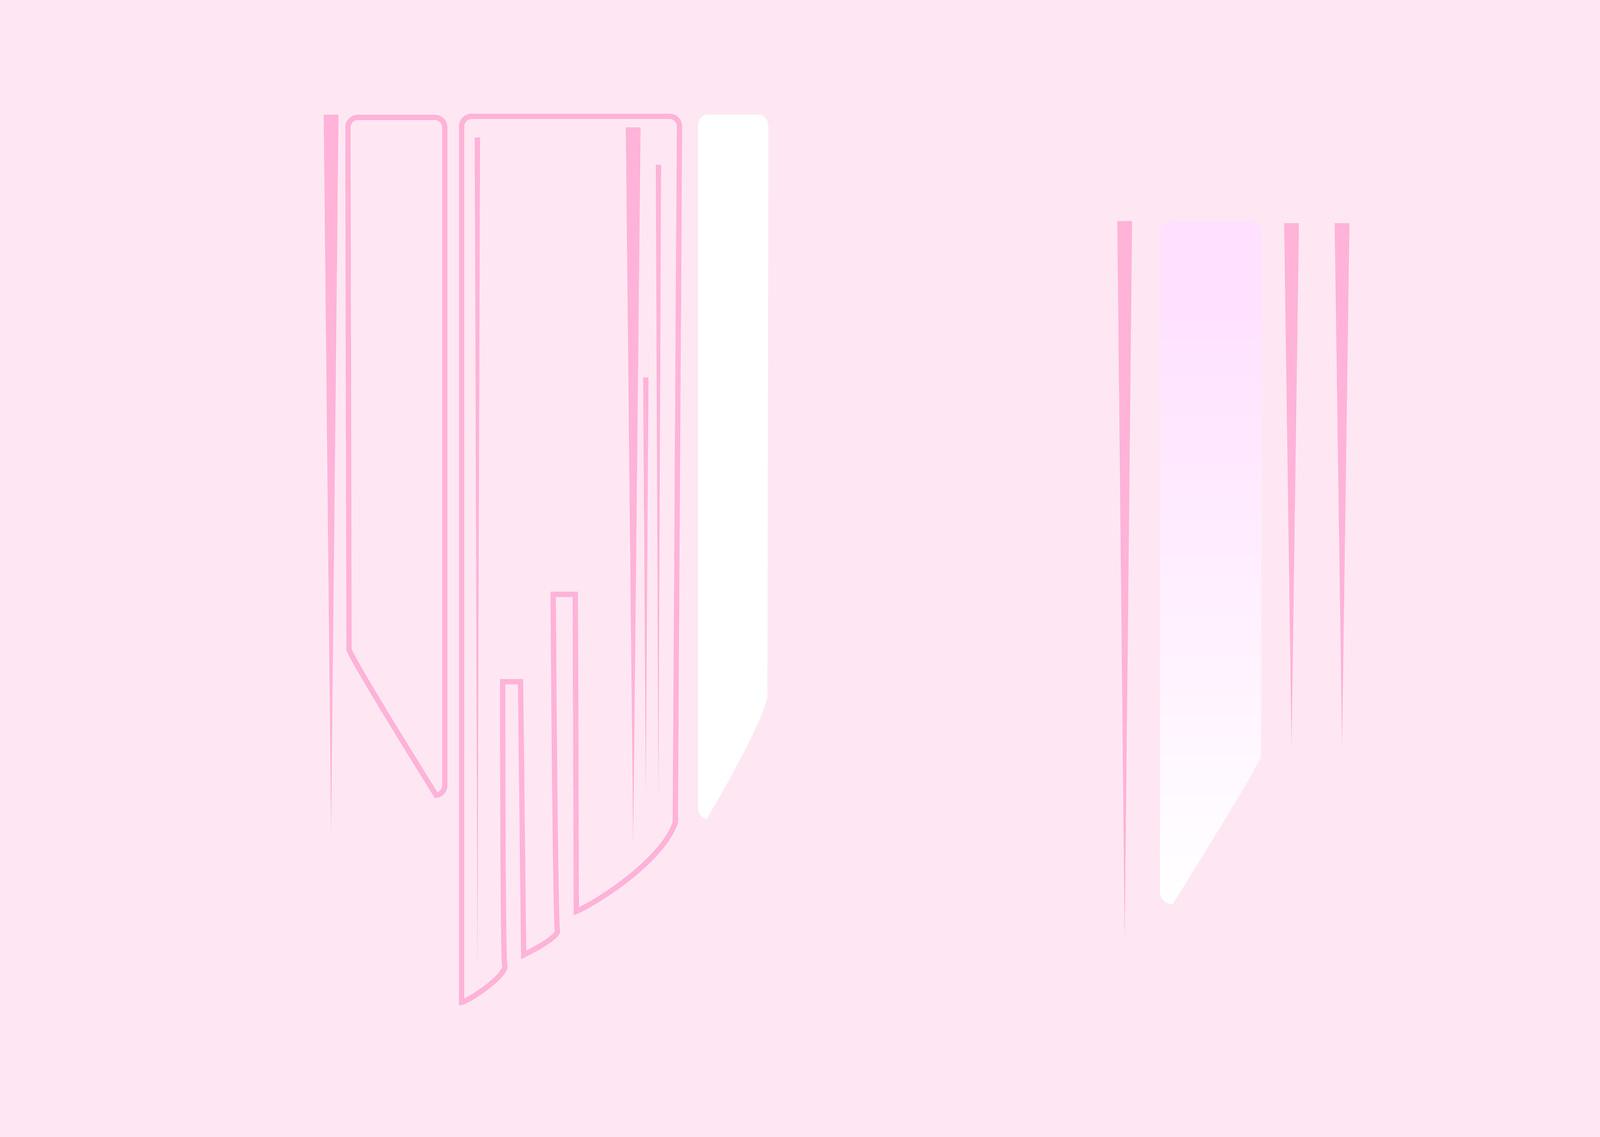 Hotel, signage, Hotel Artwork, Art Deco, Art Deco Artwork, 1930s, Design, Graphic Design, New Orleans Hotel, New Orleans Hotel Signage, BECCA, Becca Studio, becca studio, BECCA studio, Multimedia Design, Graphic Design, Branding, Web Development, Murals, Illustration, Art Direction